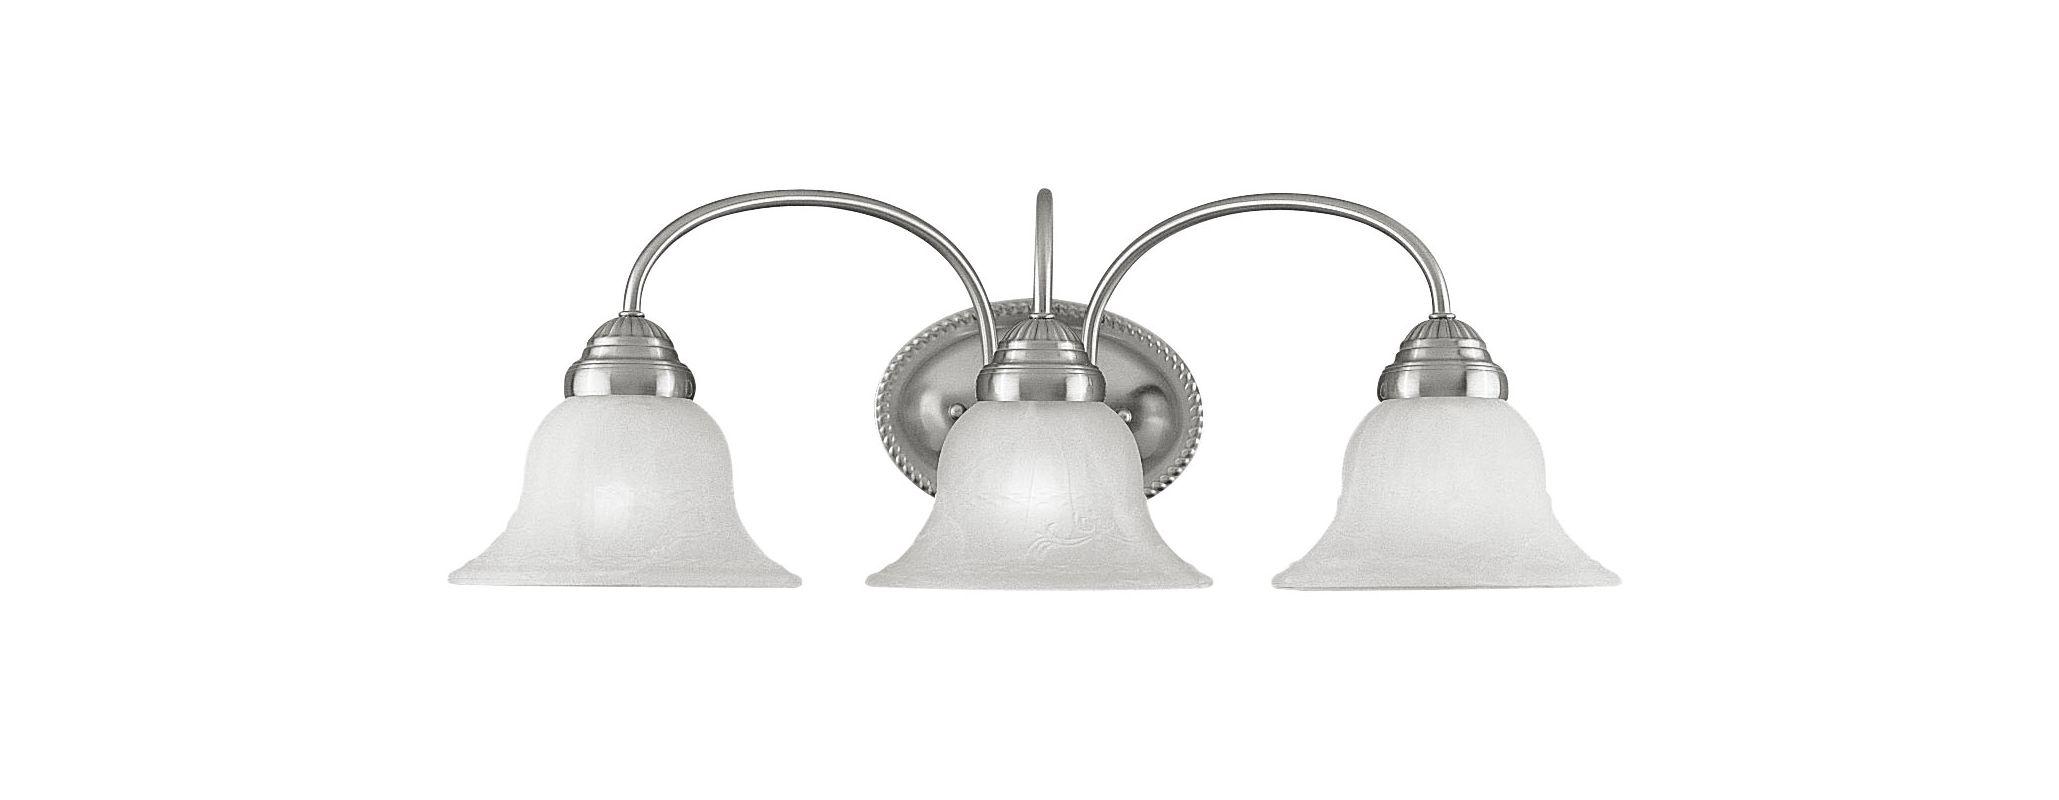 Livex Lighting 1533 Edgemont Bathroom Vanity Bar with 3 Lights Brushed